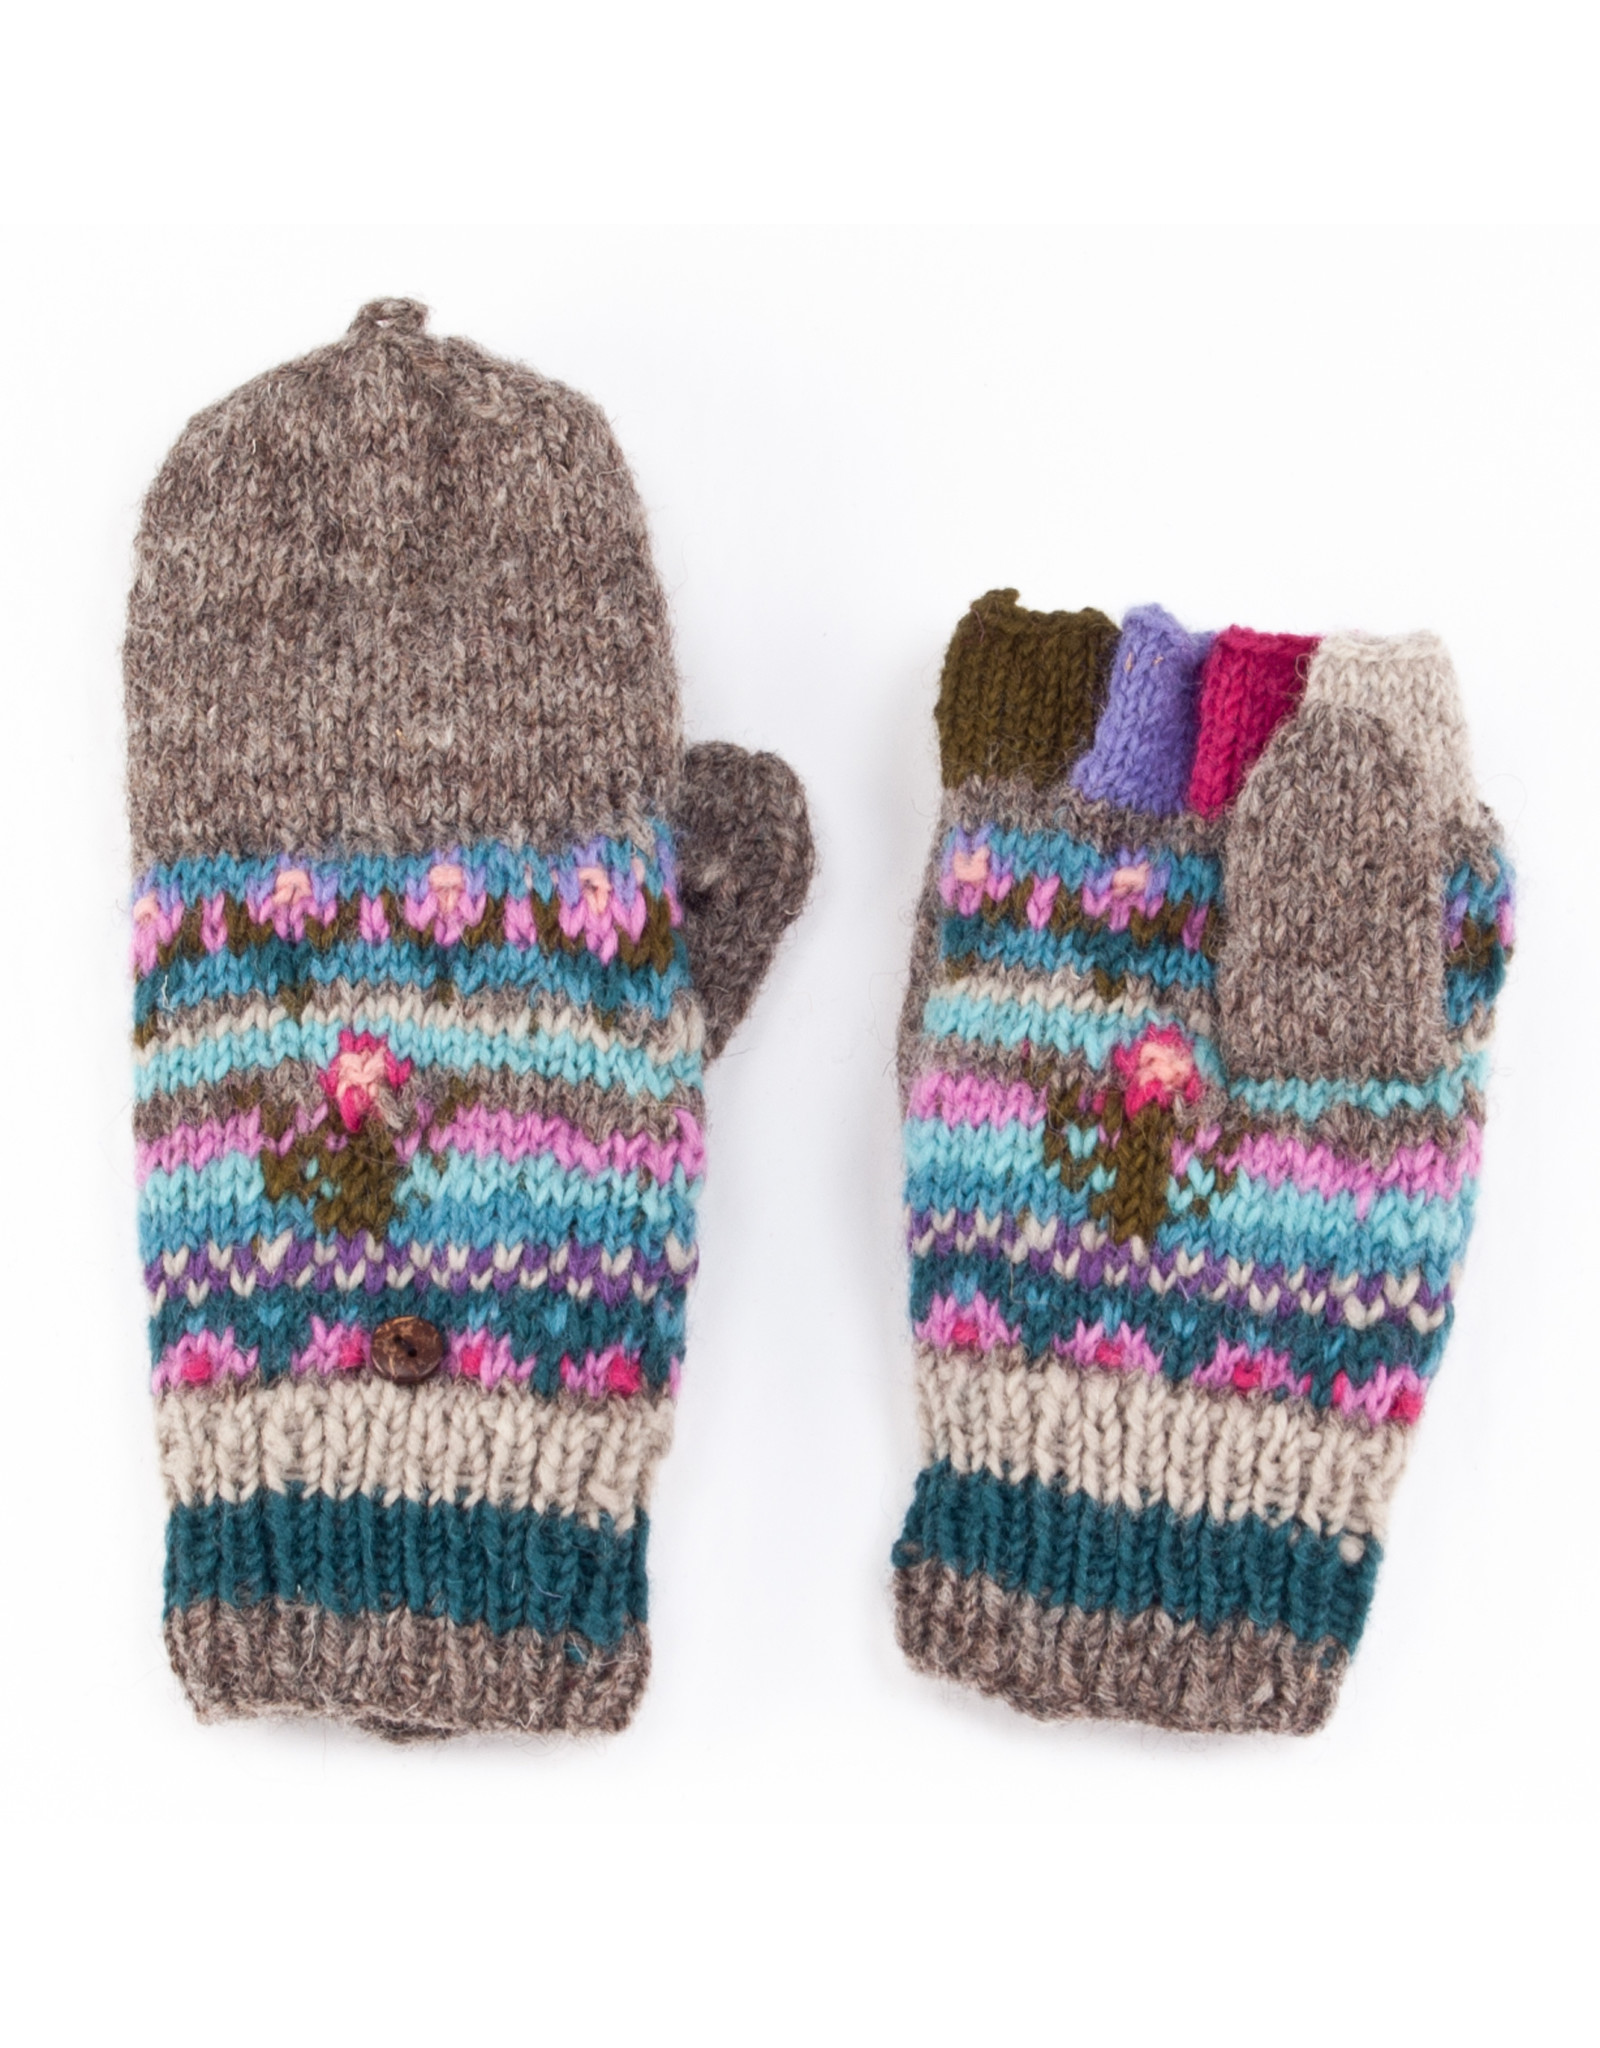 Lost Horizons Galena Knit Finger Mittens, Nepal.